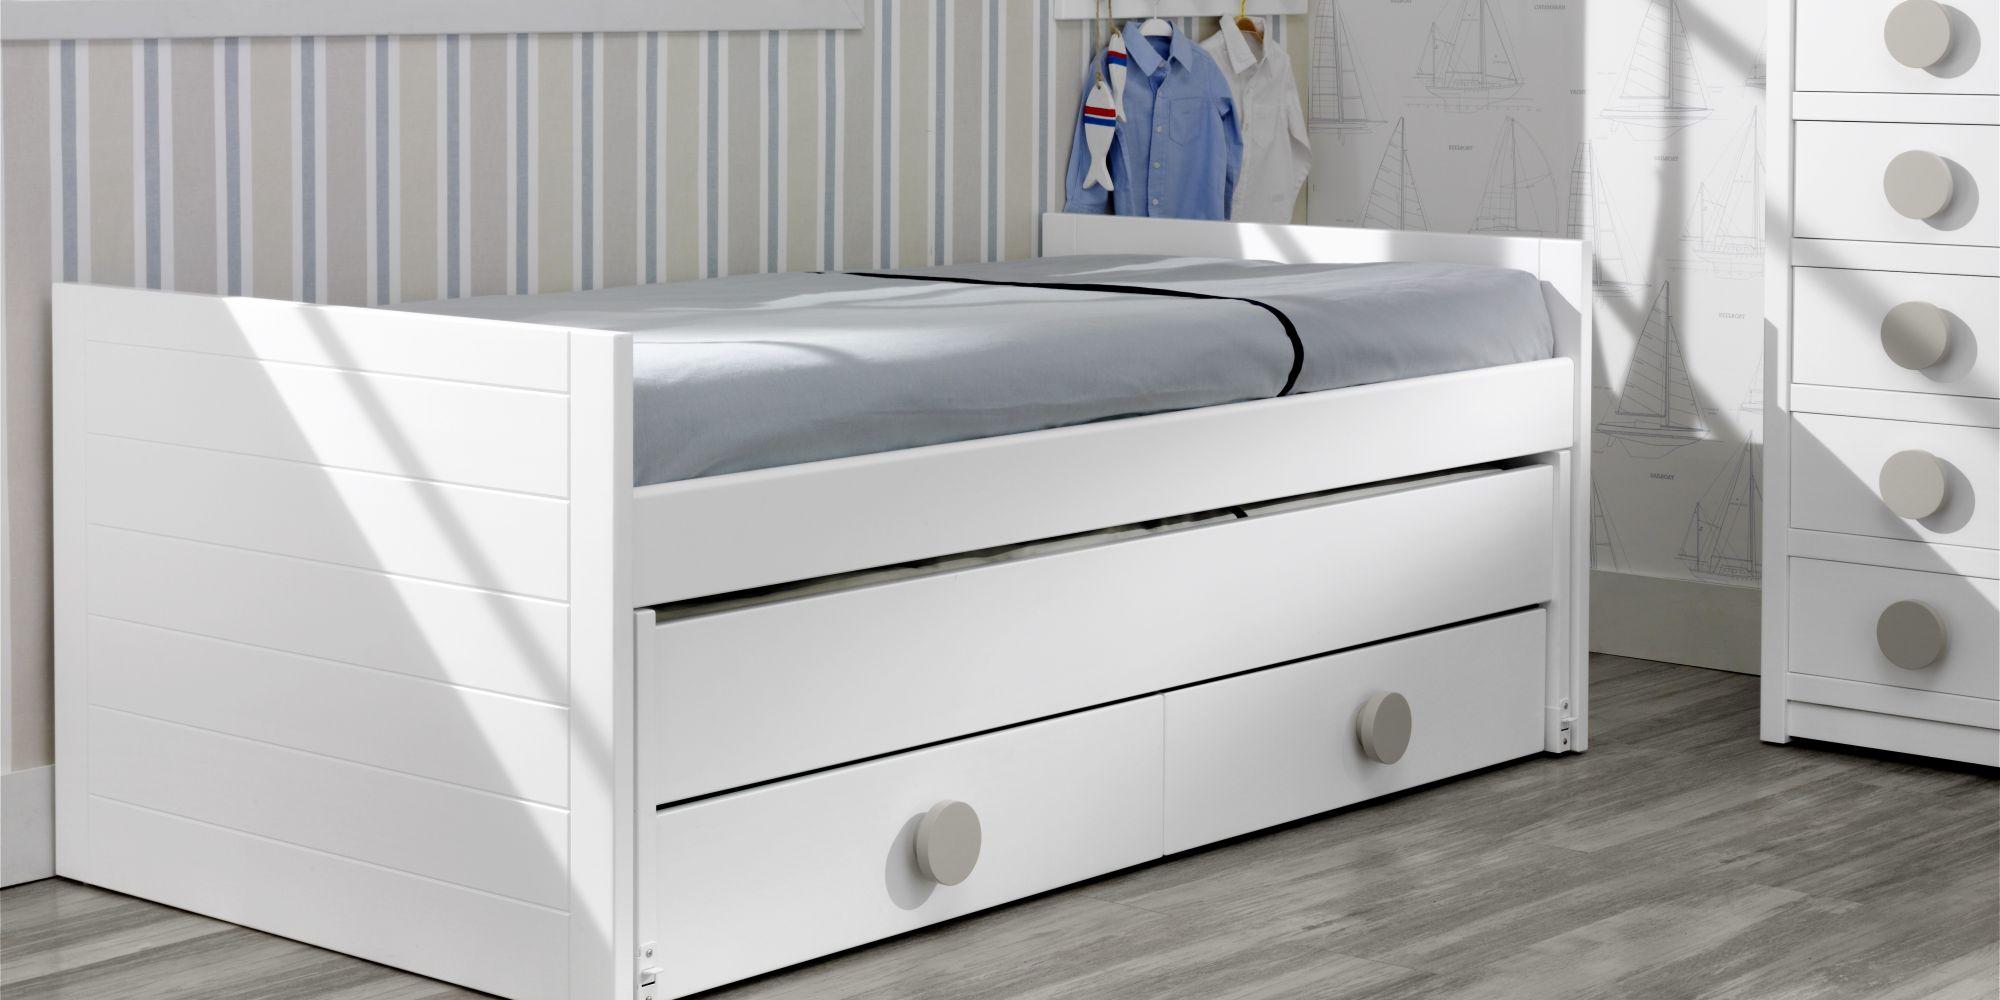 cama nido de dos camas con cajones inferiores